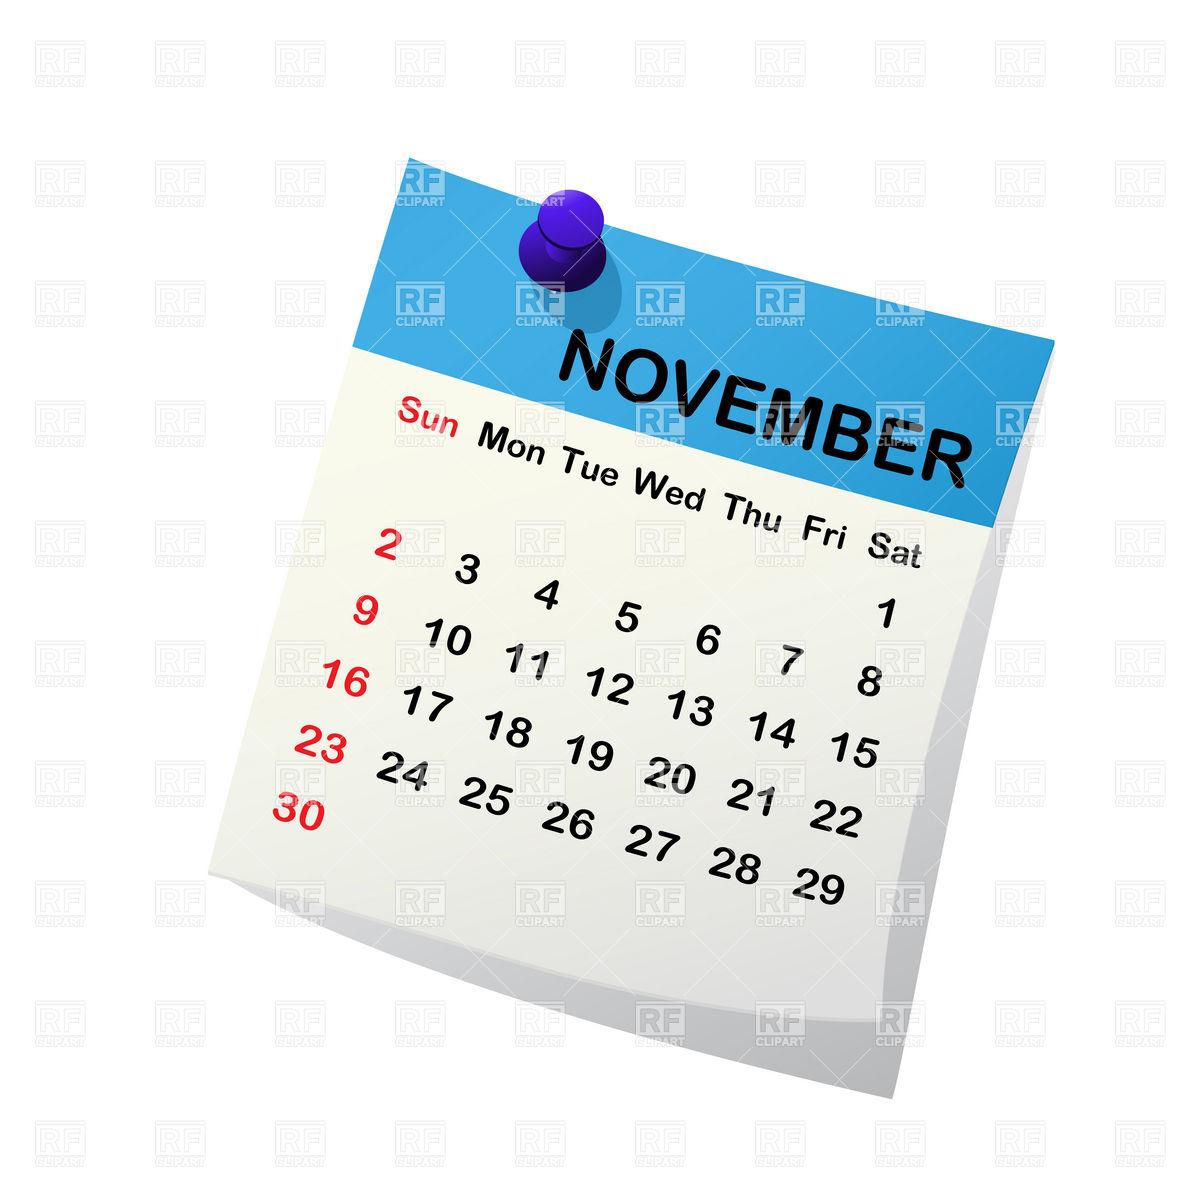 November 2014 month calendar Stock Vector Image.